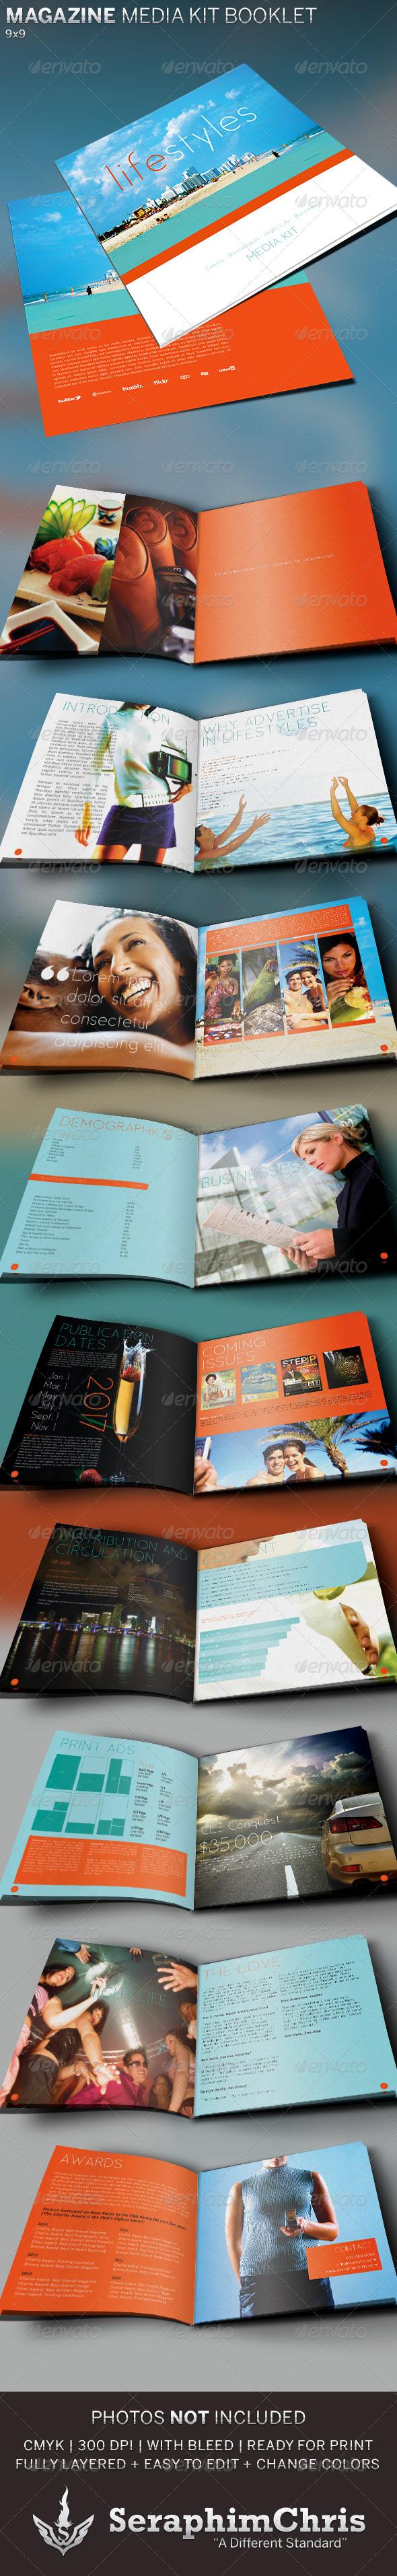 GraphicRiver Magazine Media Kit Booklet Template 5237774